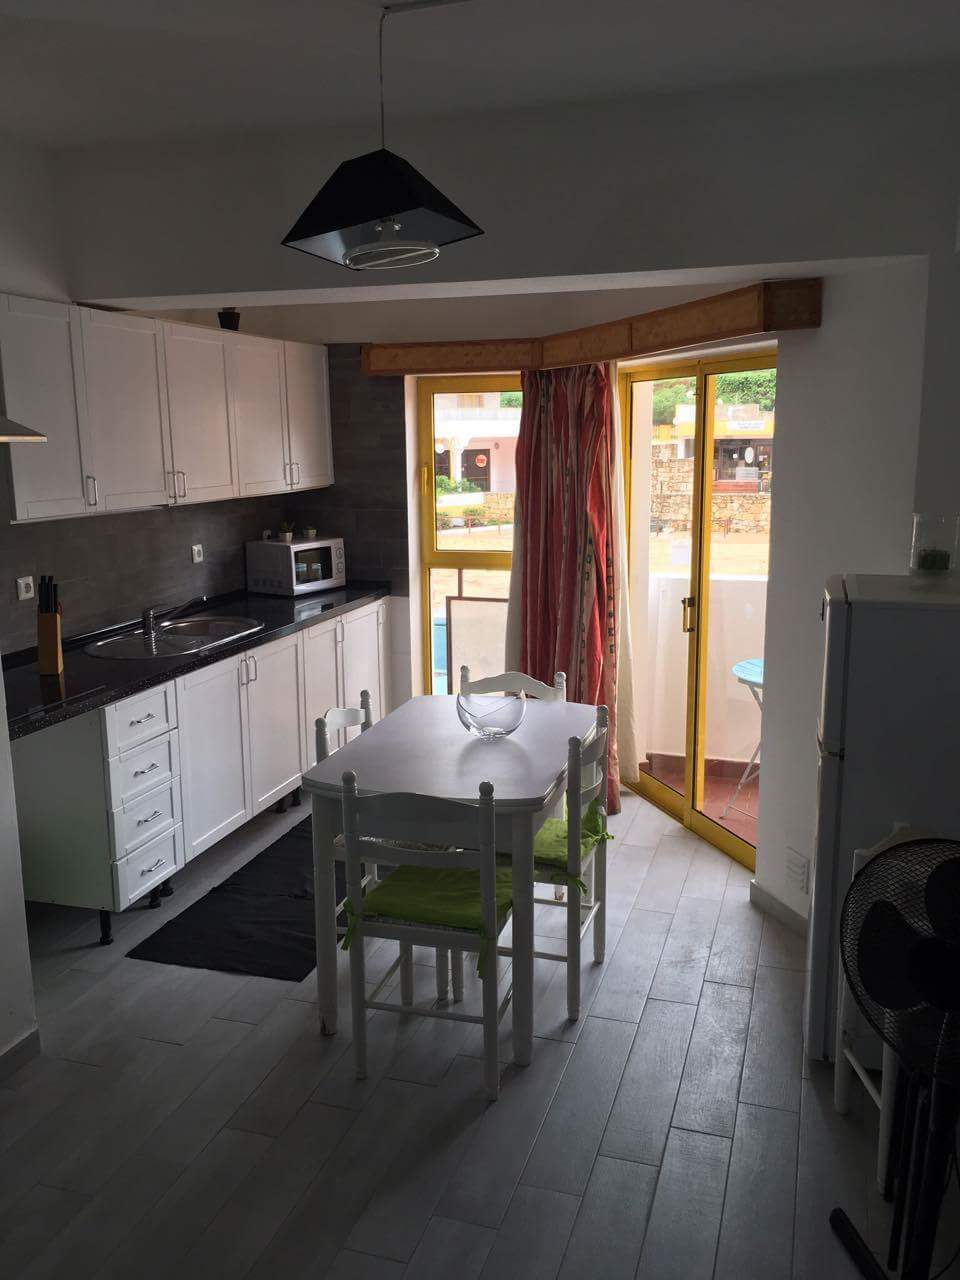 Location appartements et villas de vacance, Apartamento T1 Praia da Rocha à Portimão, Portugal Algarve, REF_IMG_4055_4057